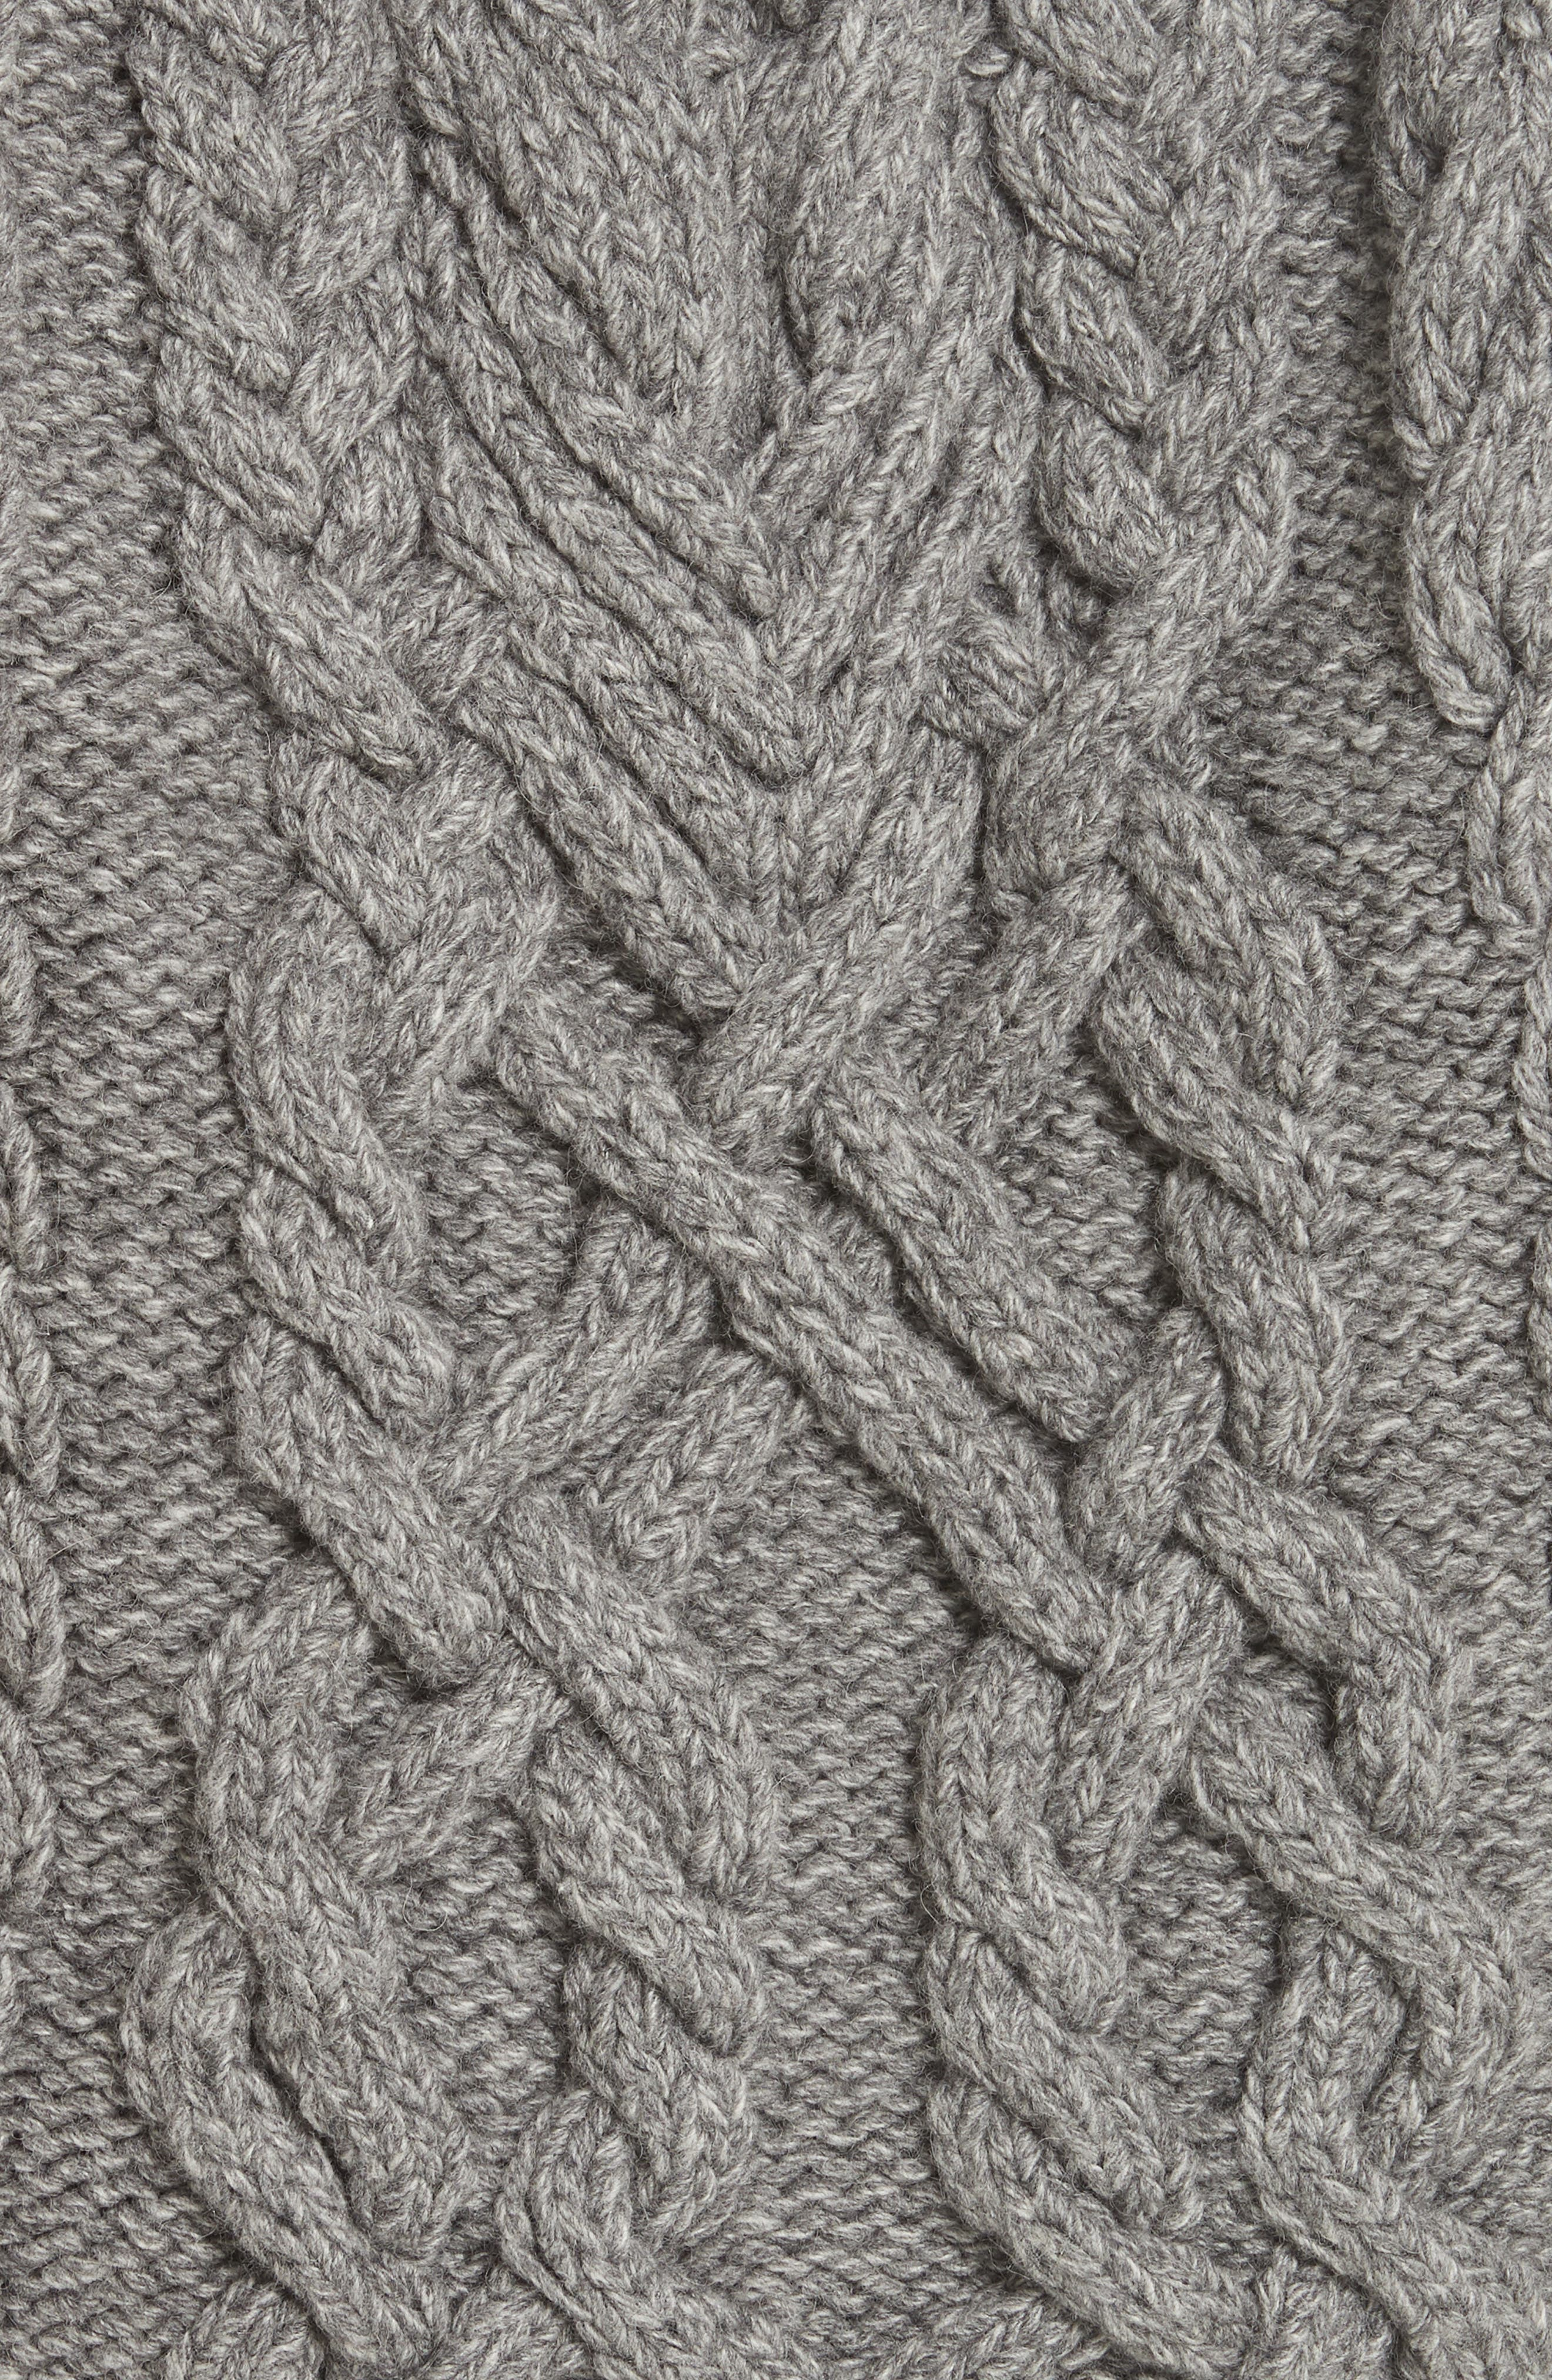 Mélange Cable Knit Hooded Sweater,                             Alternate thumbnail 5, color,                             GREY MELANGE